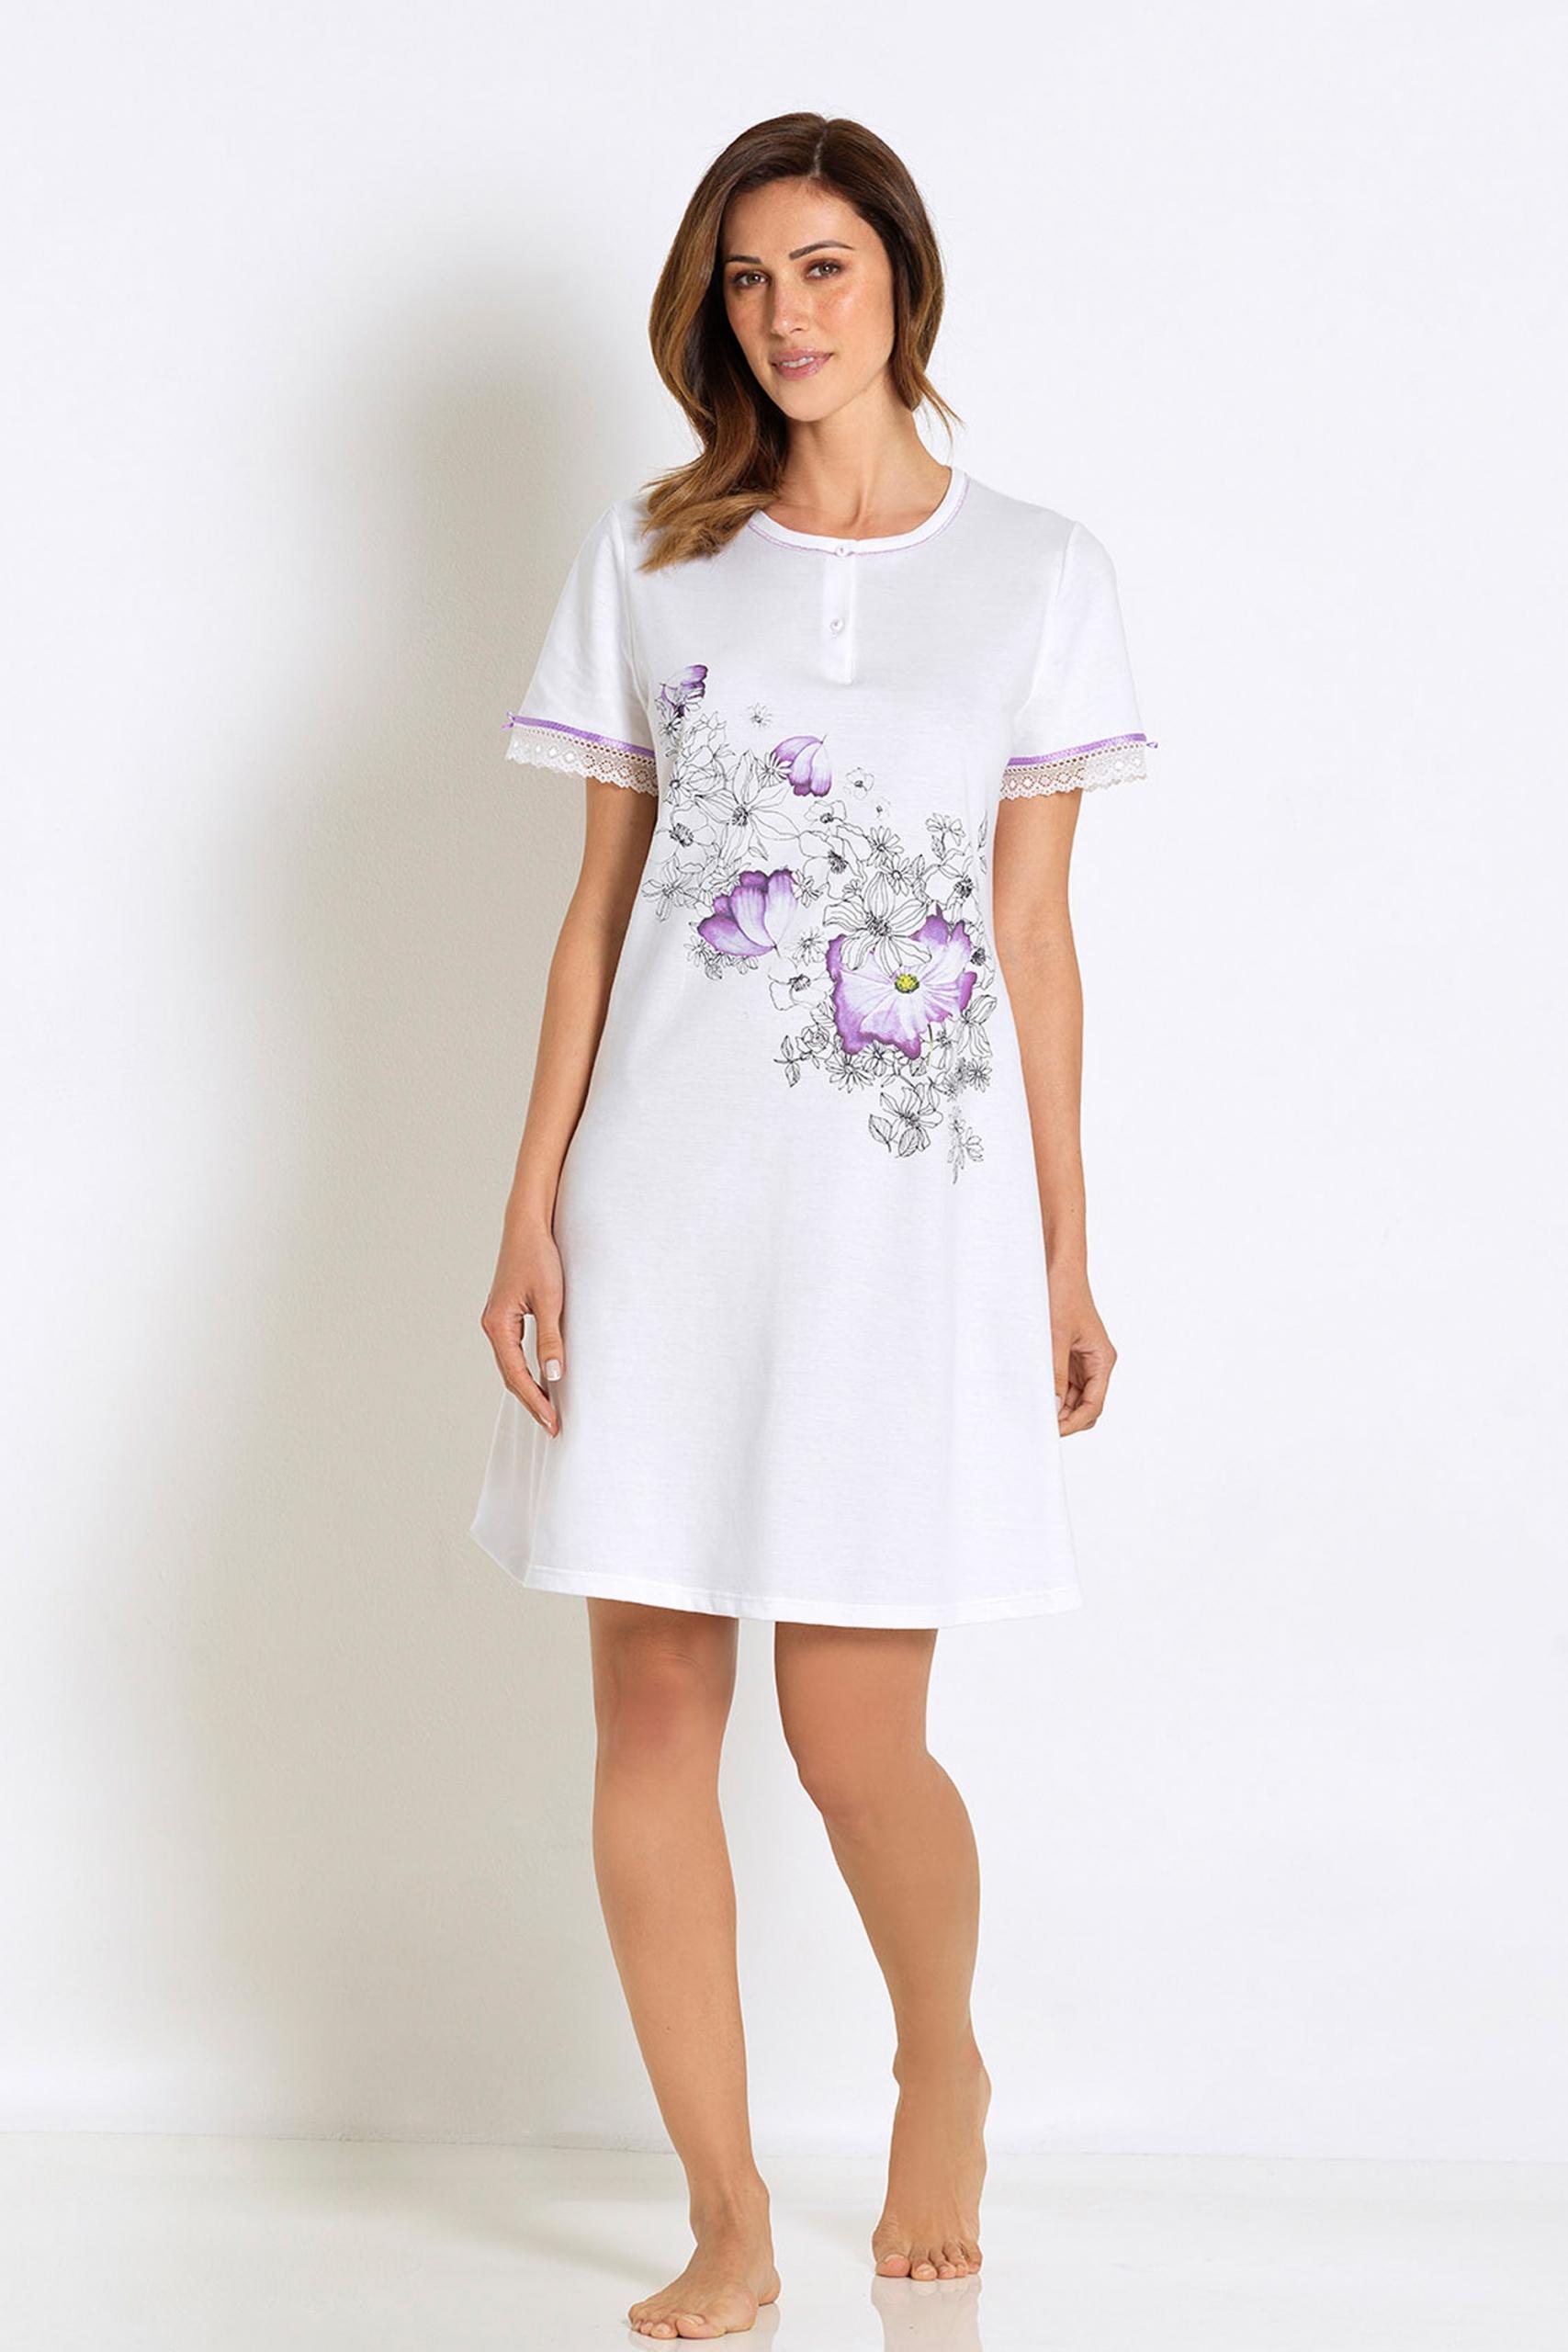 Kayanna Linclalore Cotton Nightshirt